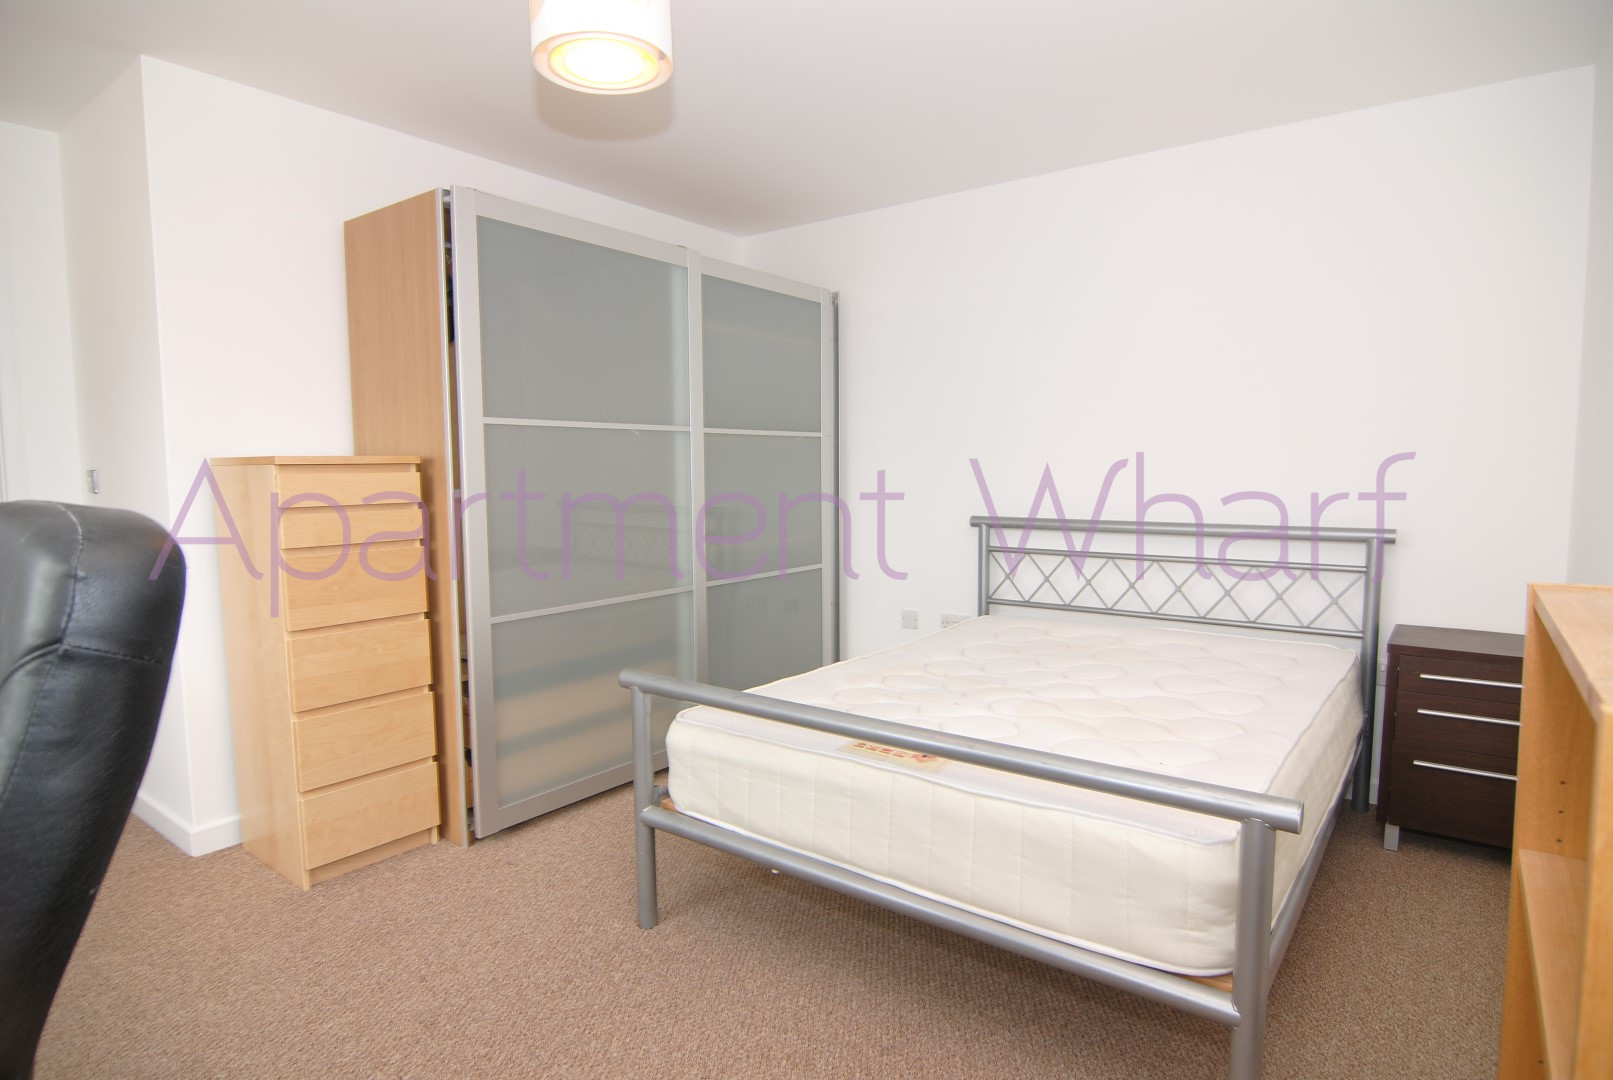 room-d-2-Large.JPG